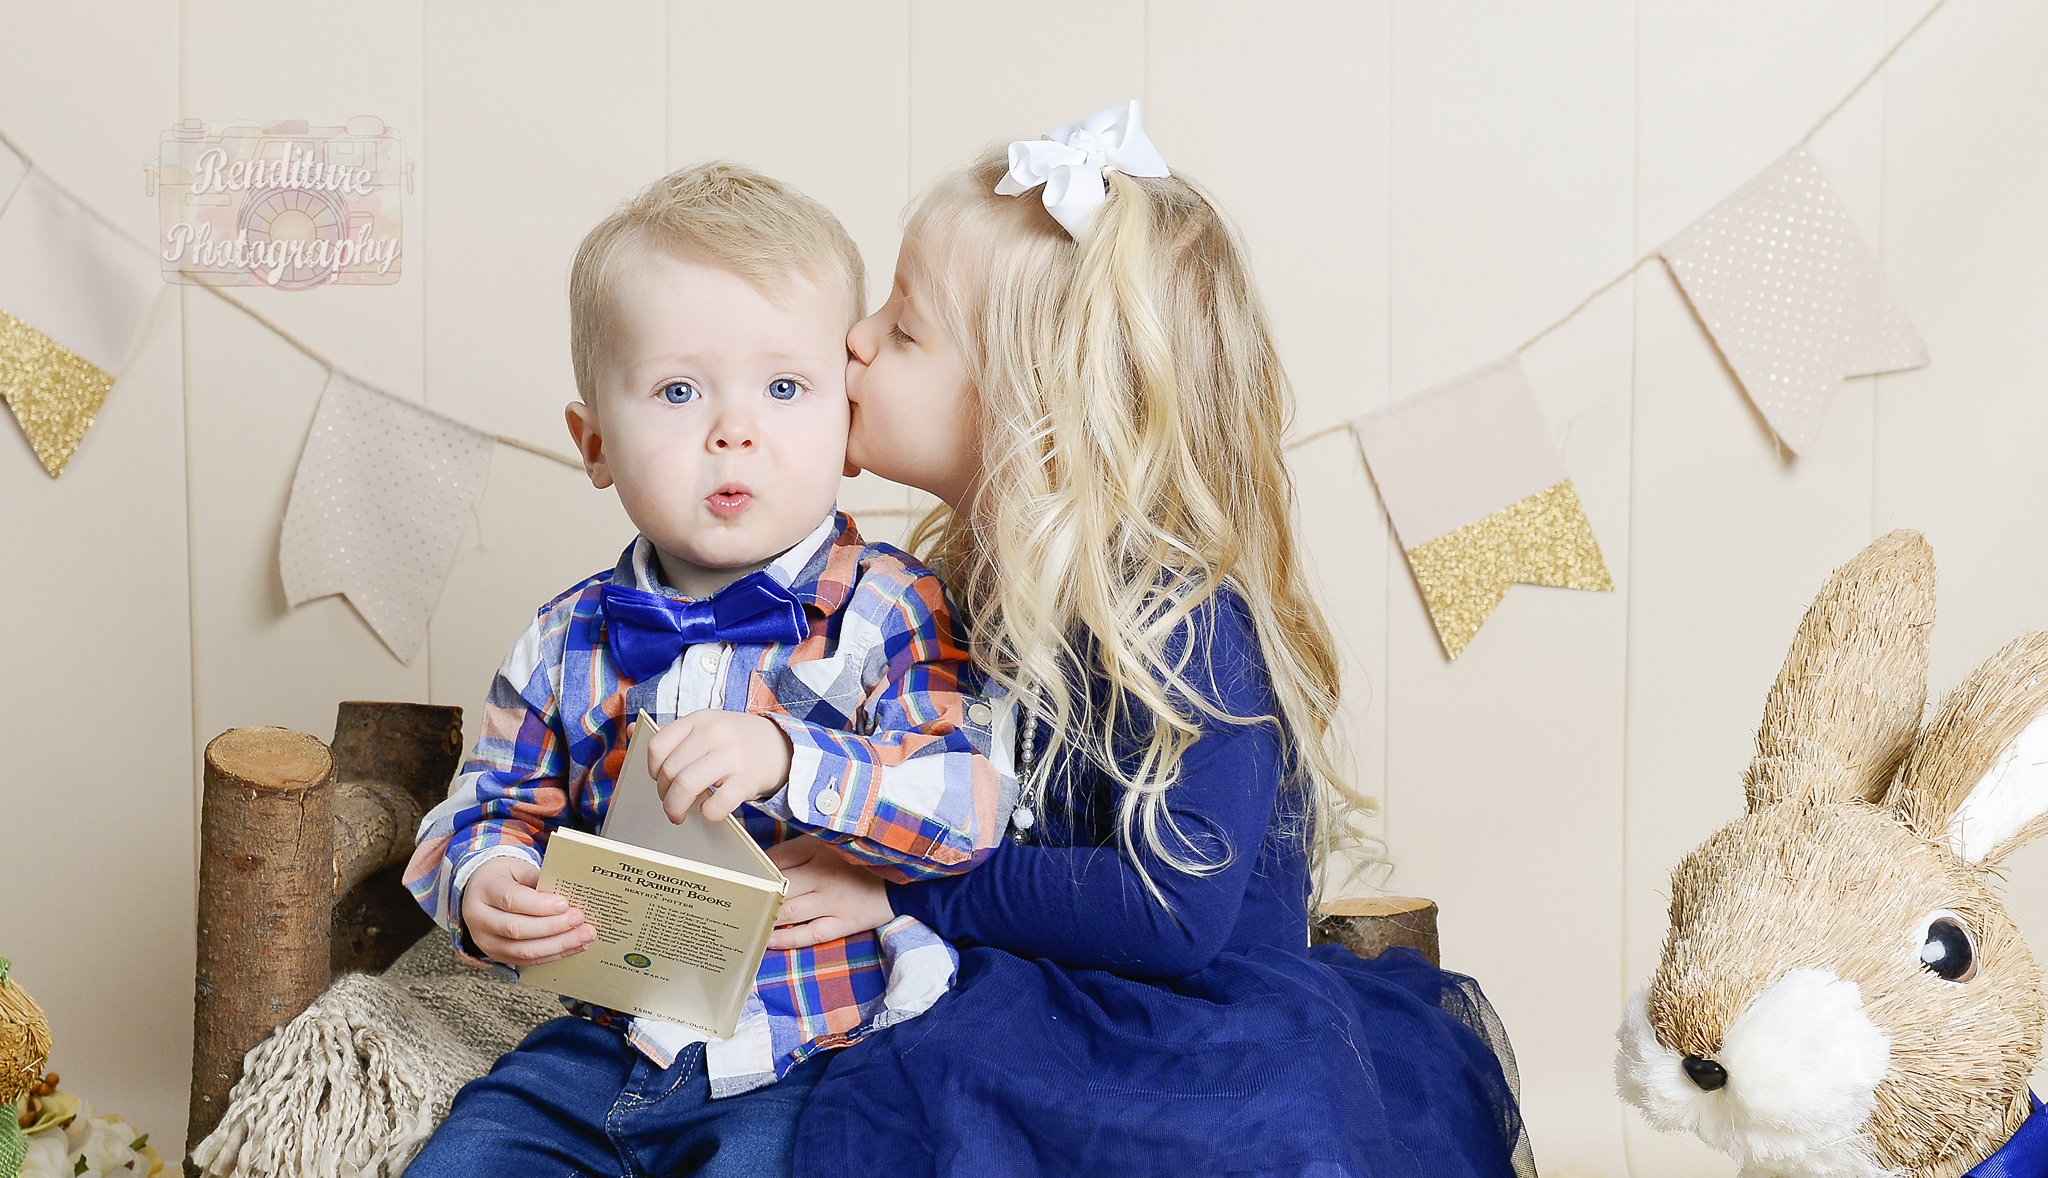 Saskatoon-Children-Family-Renditure-Photography-Photographer-Easter-Peter-Rabbit-Saskatchewan-613FBR.jpg